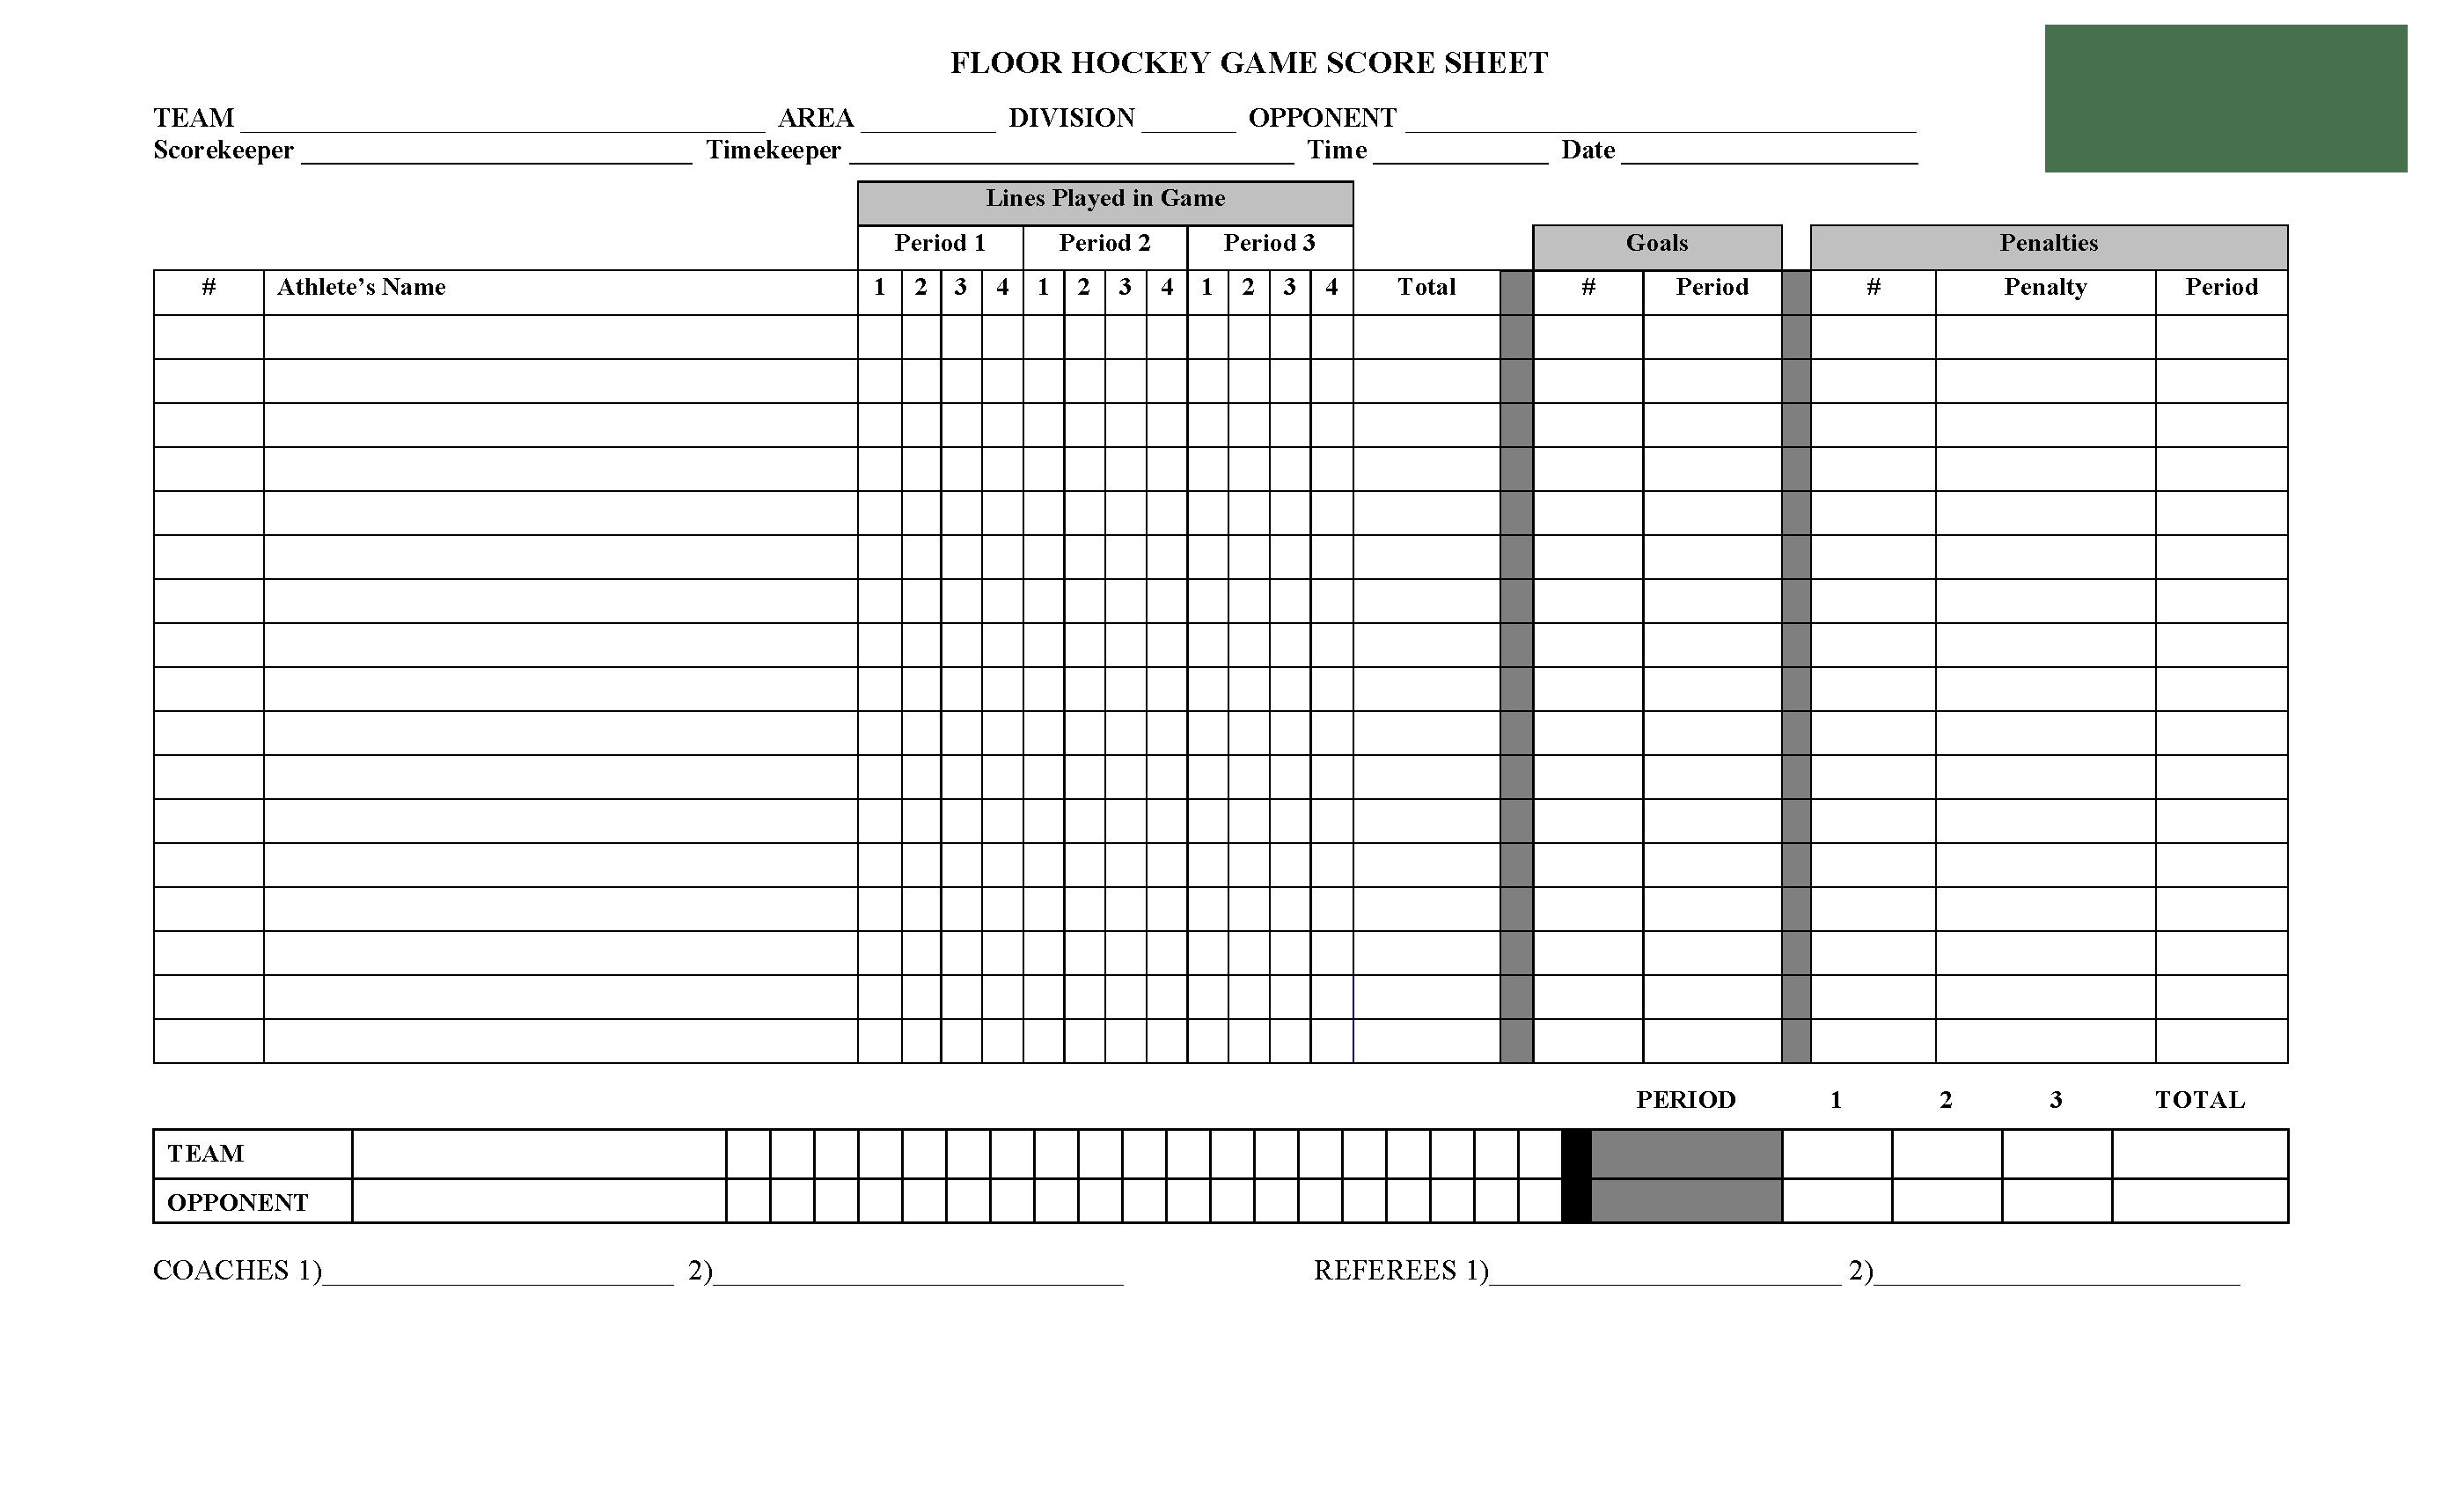 Score Sheet For Hockey